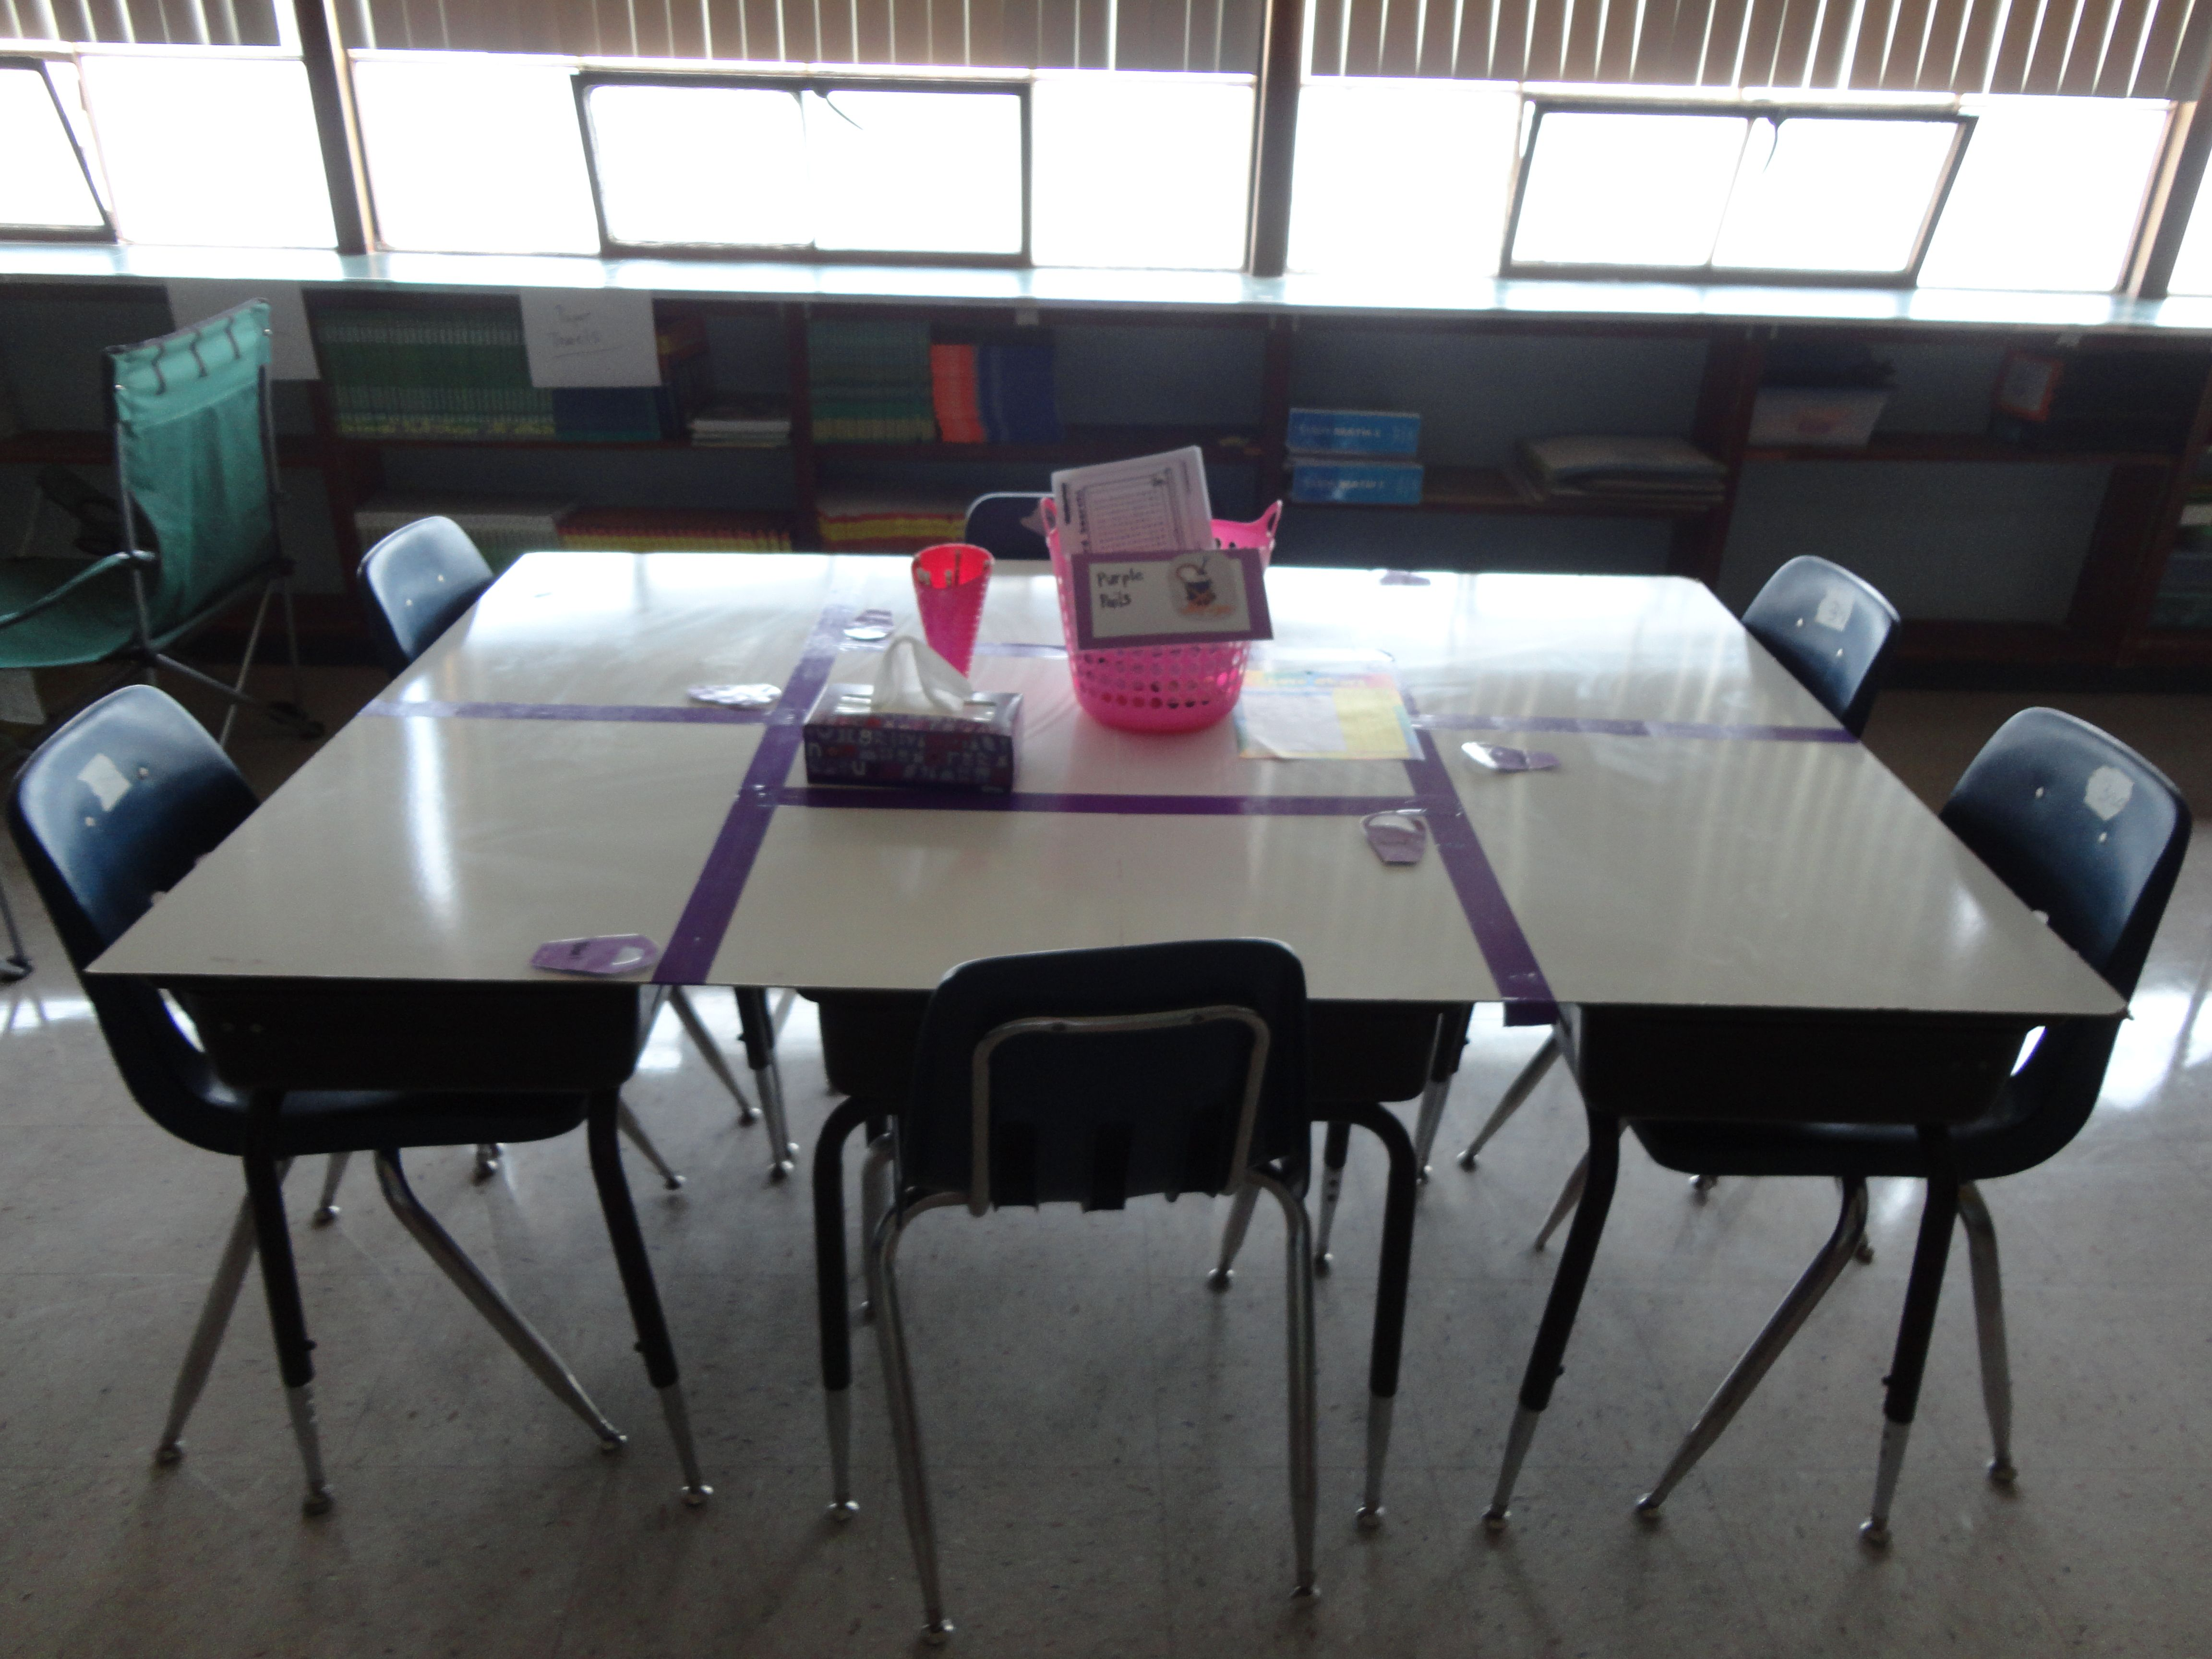 Whiteboard desks a pretty cool idea classy classroom pinterest